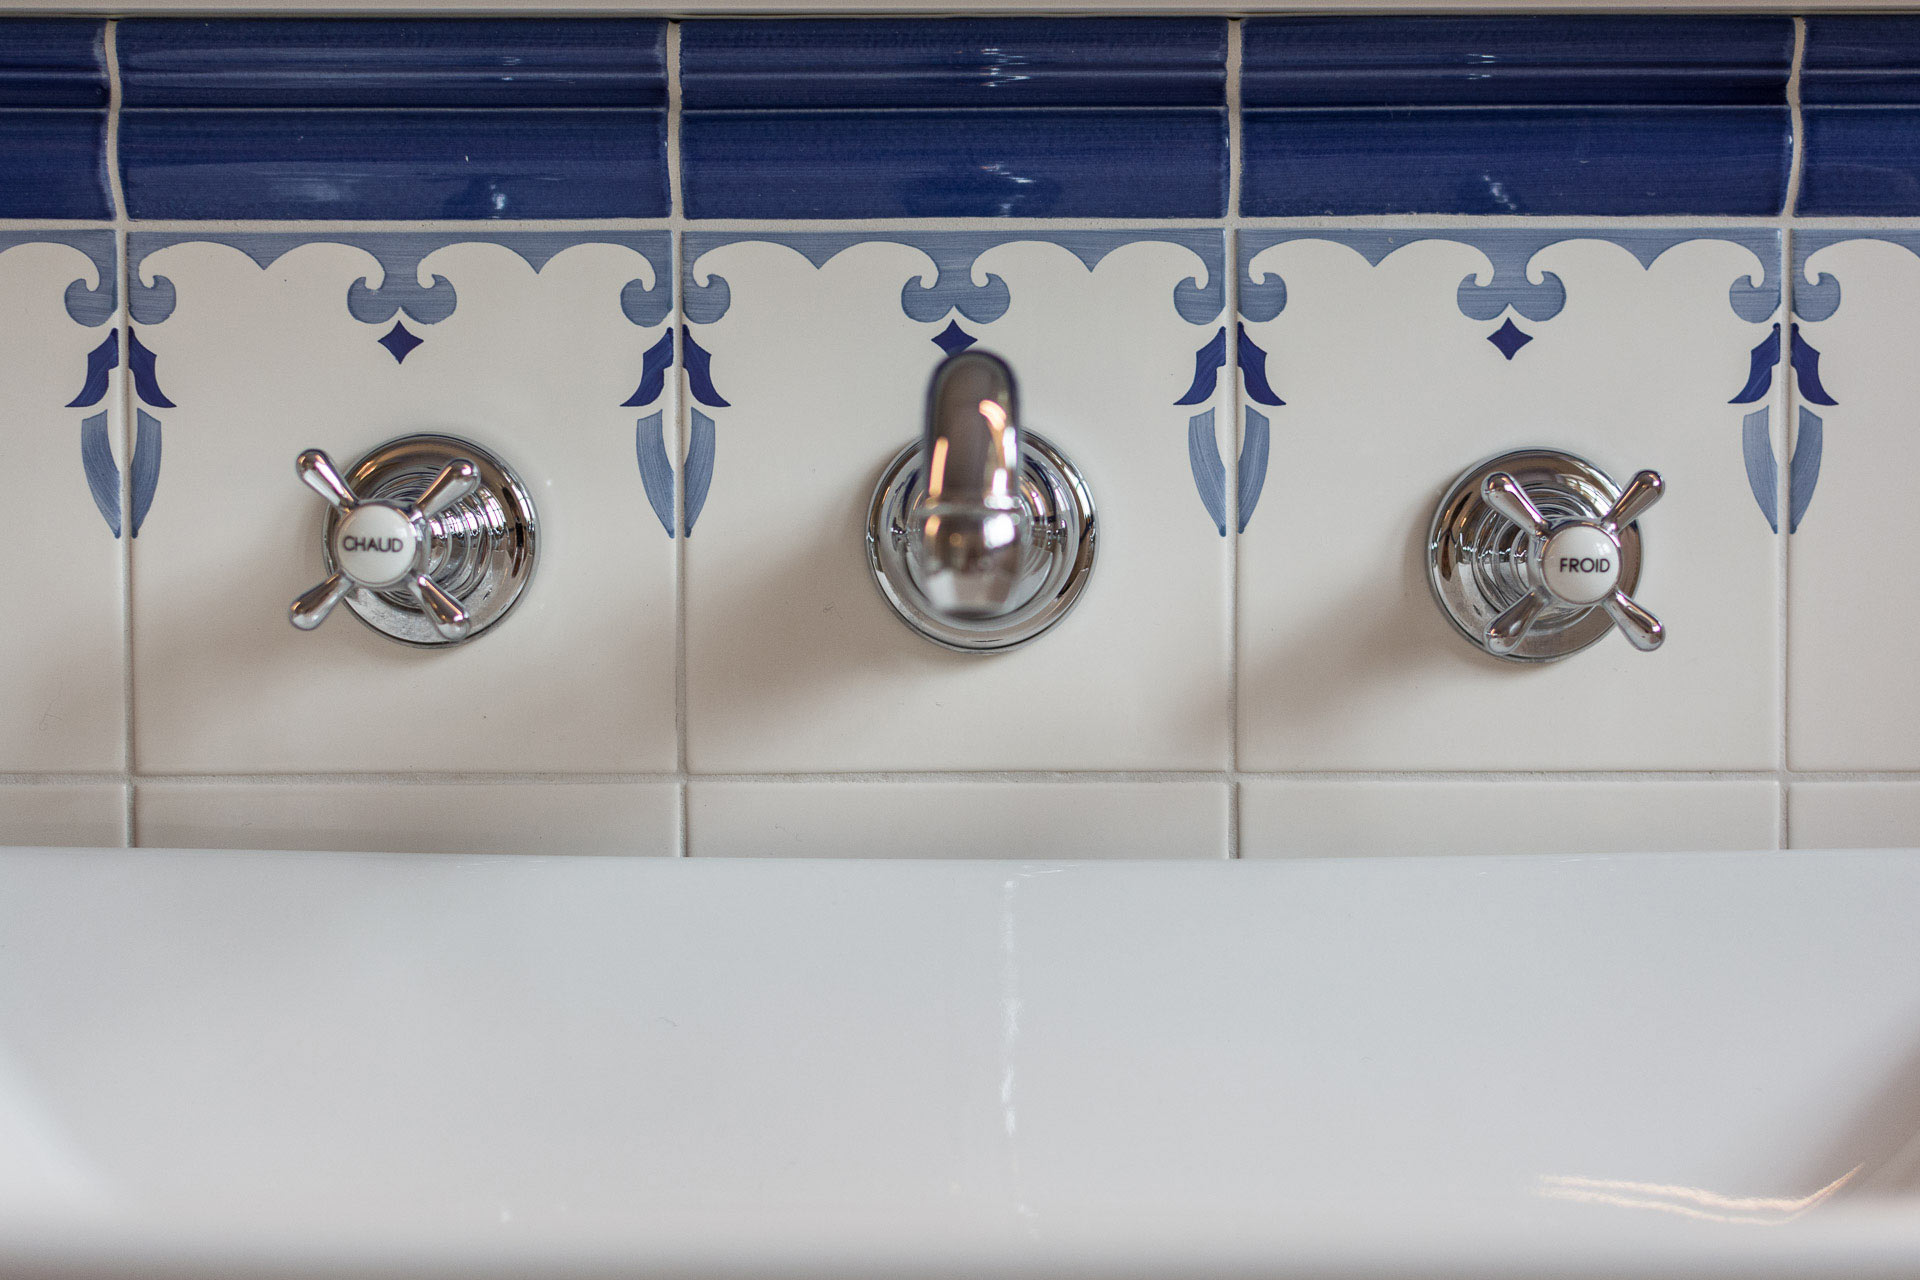 Badausstellung - Ceramica Blu Fliesen handbemalt vivante Design